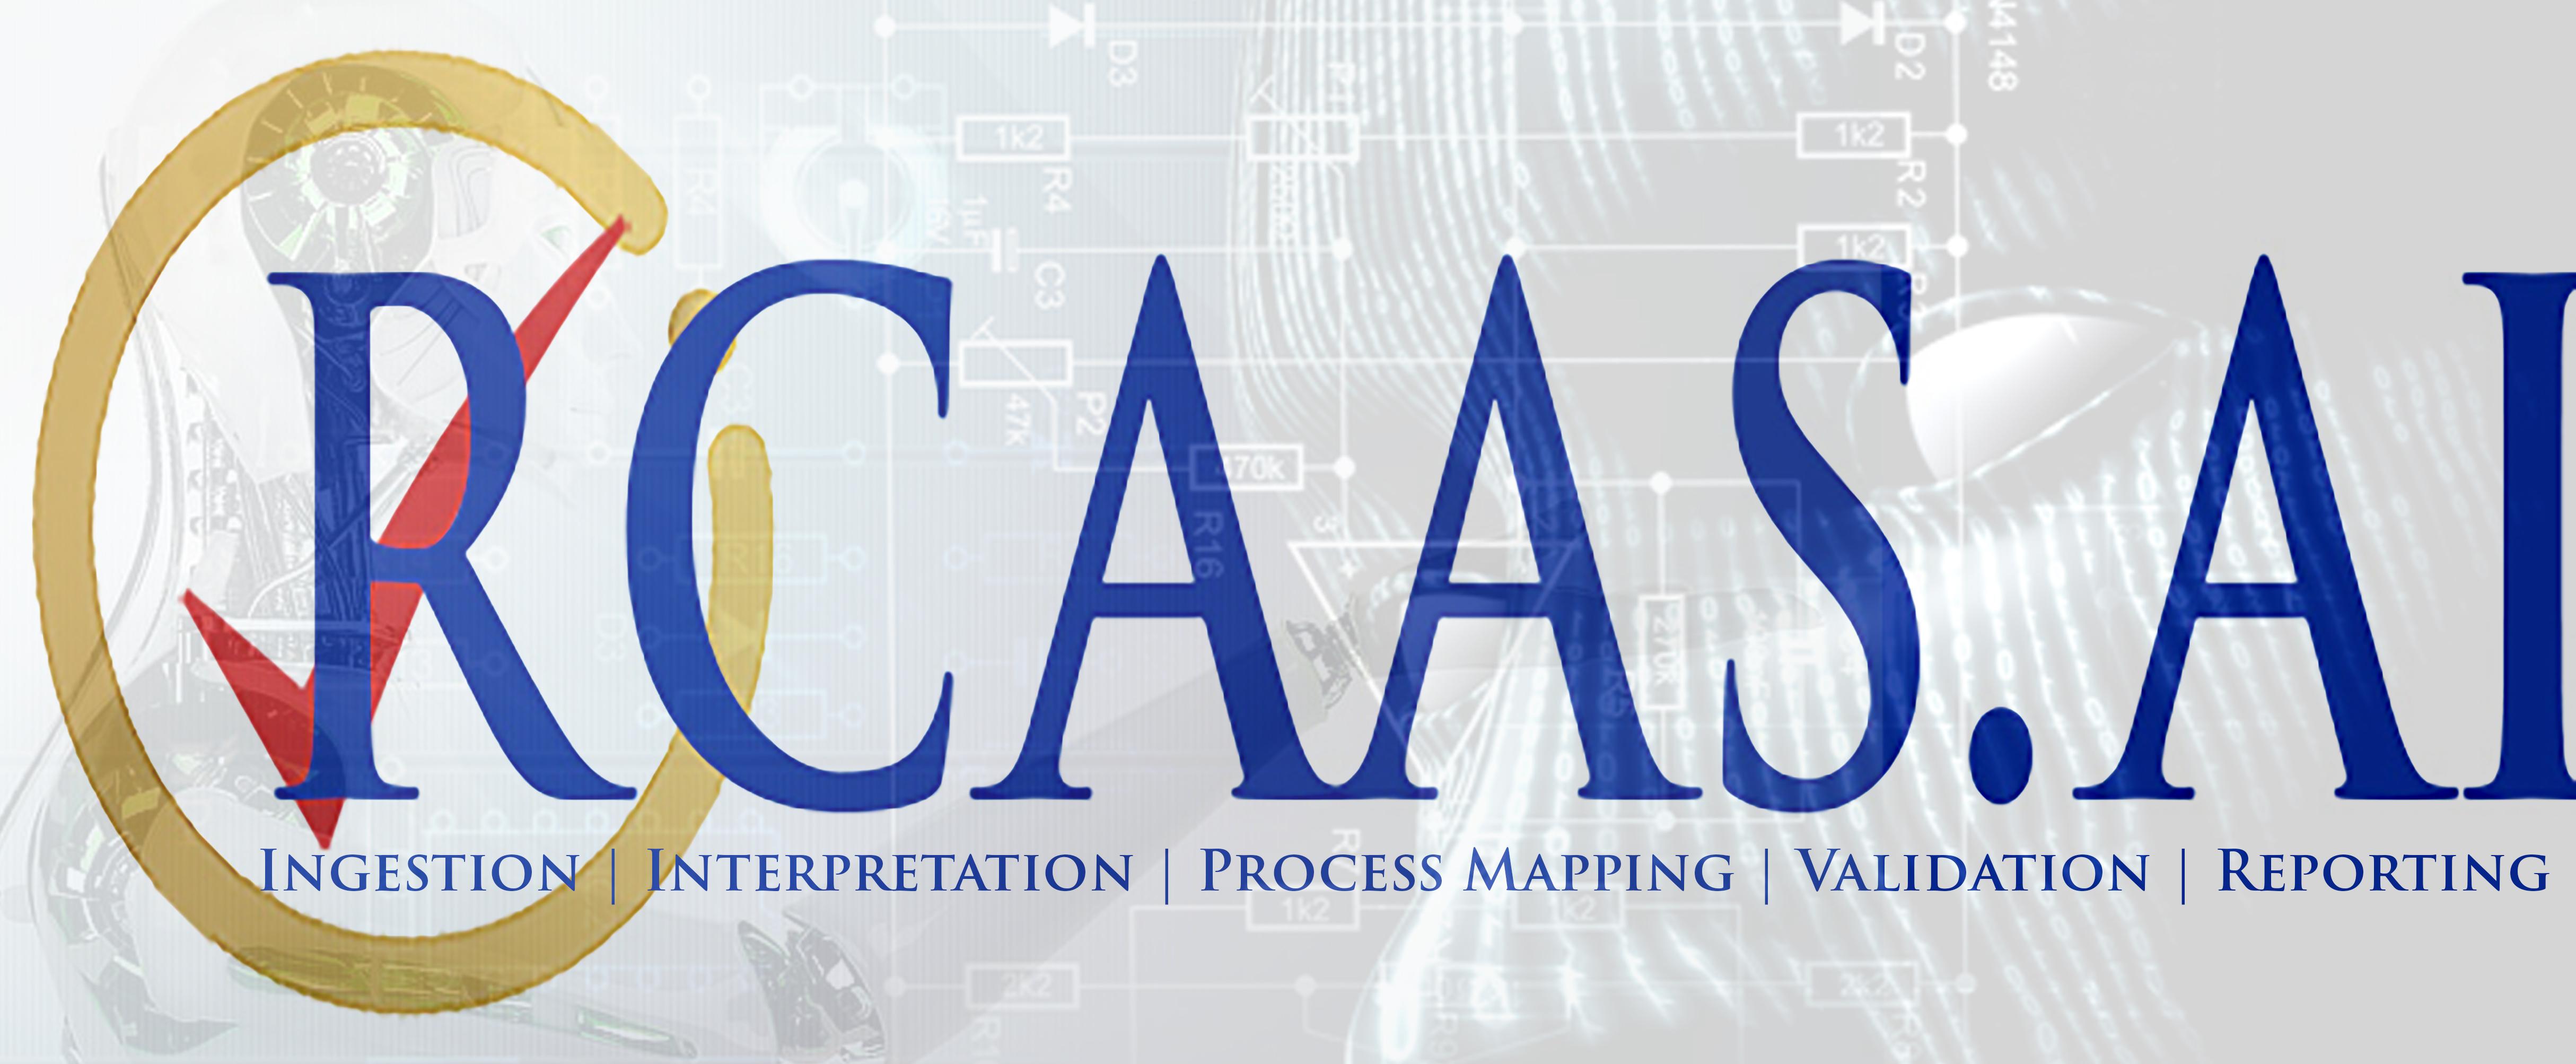 RCAAS.AI-Logo